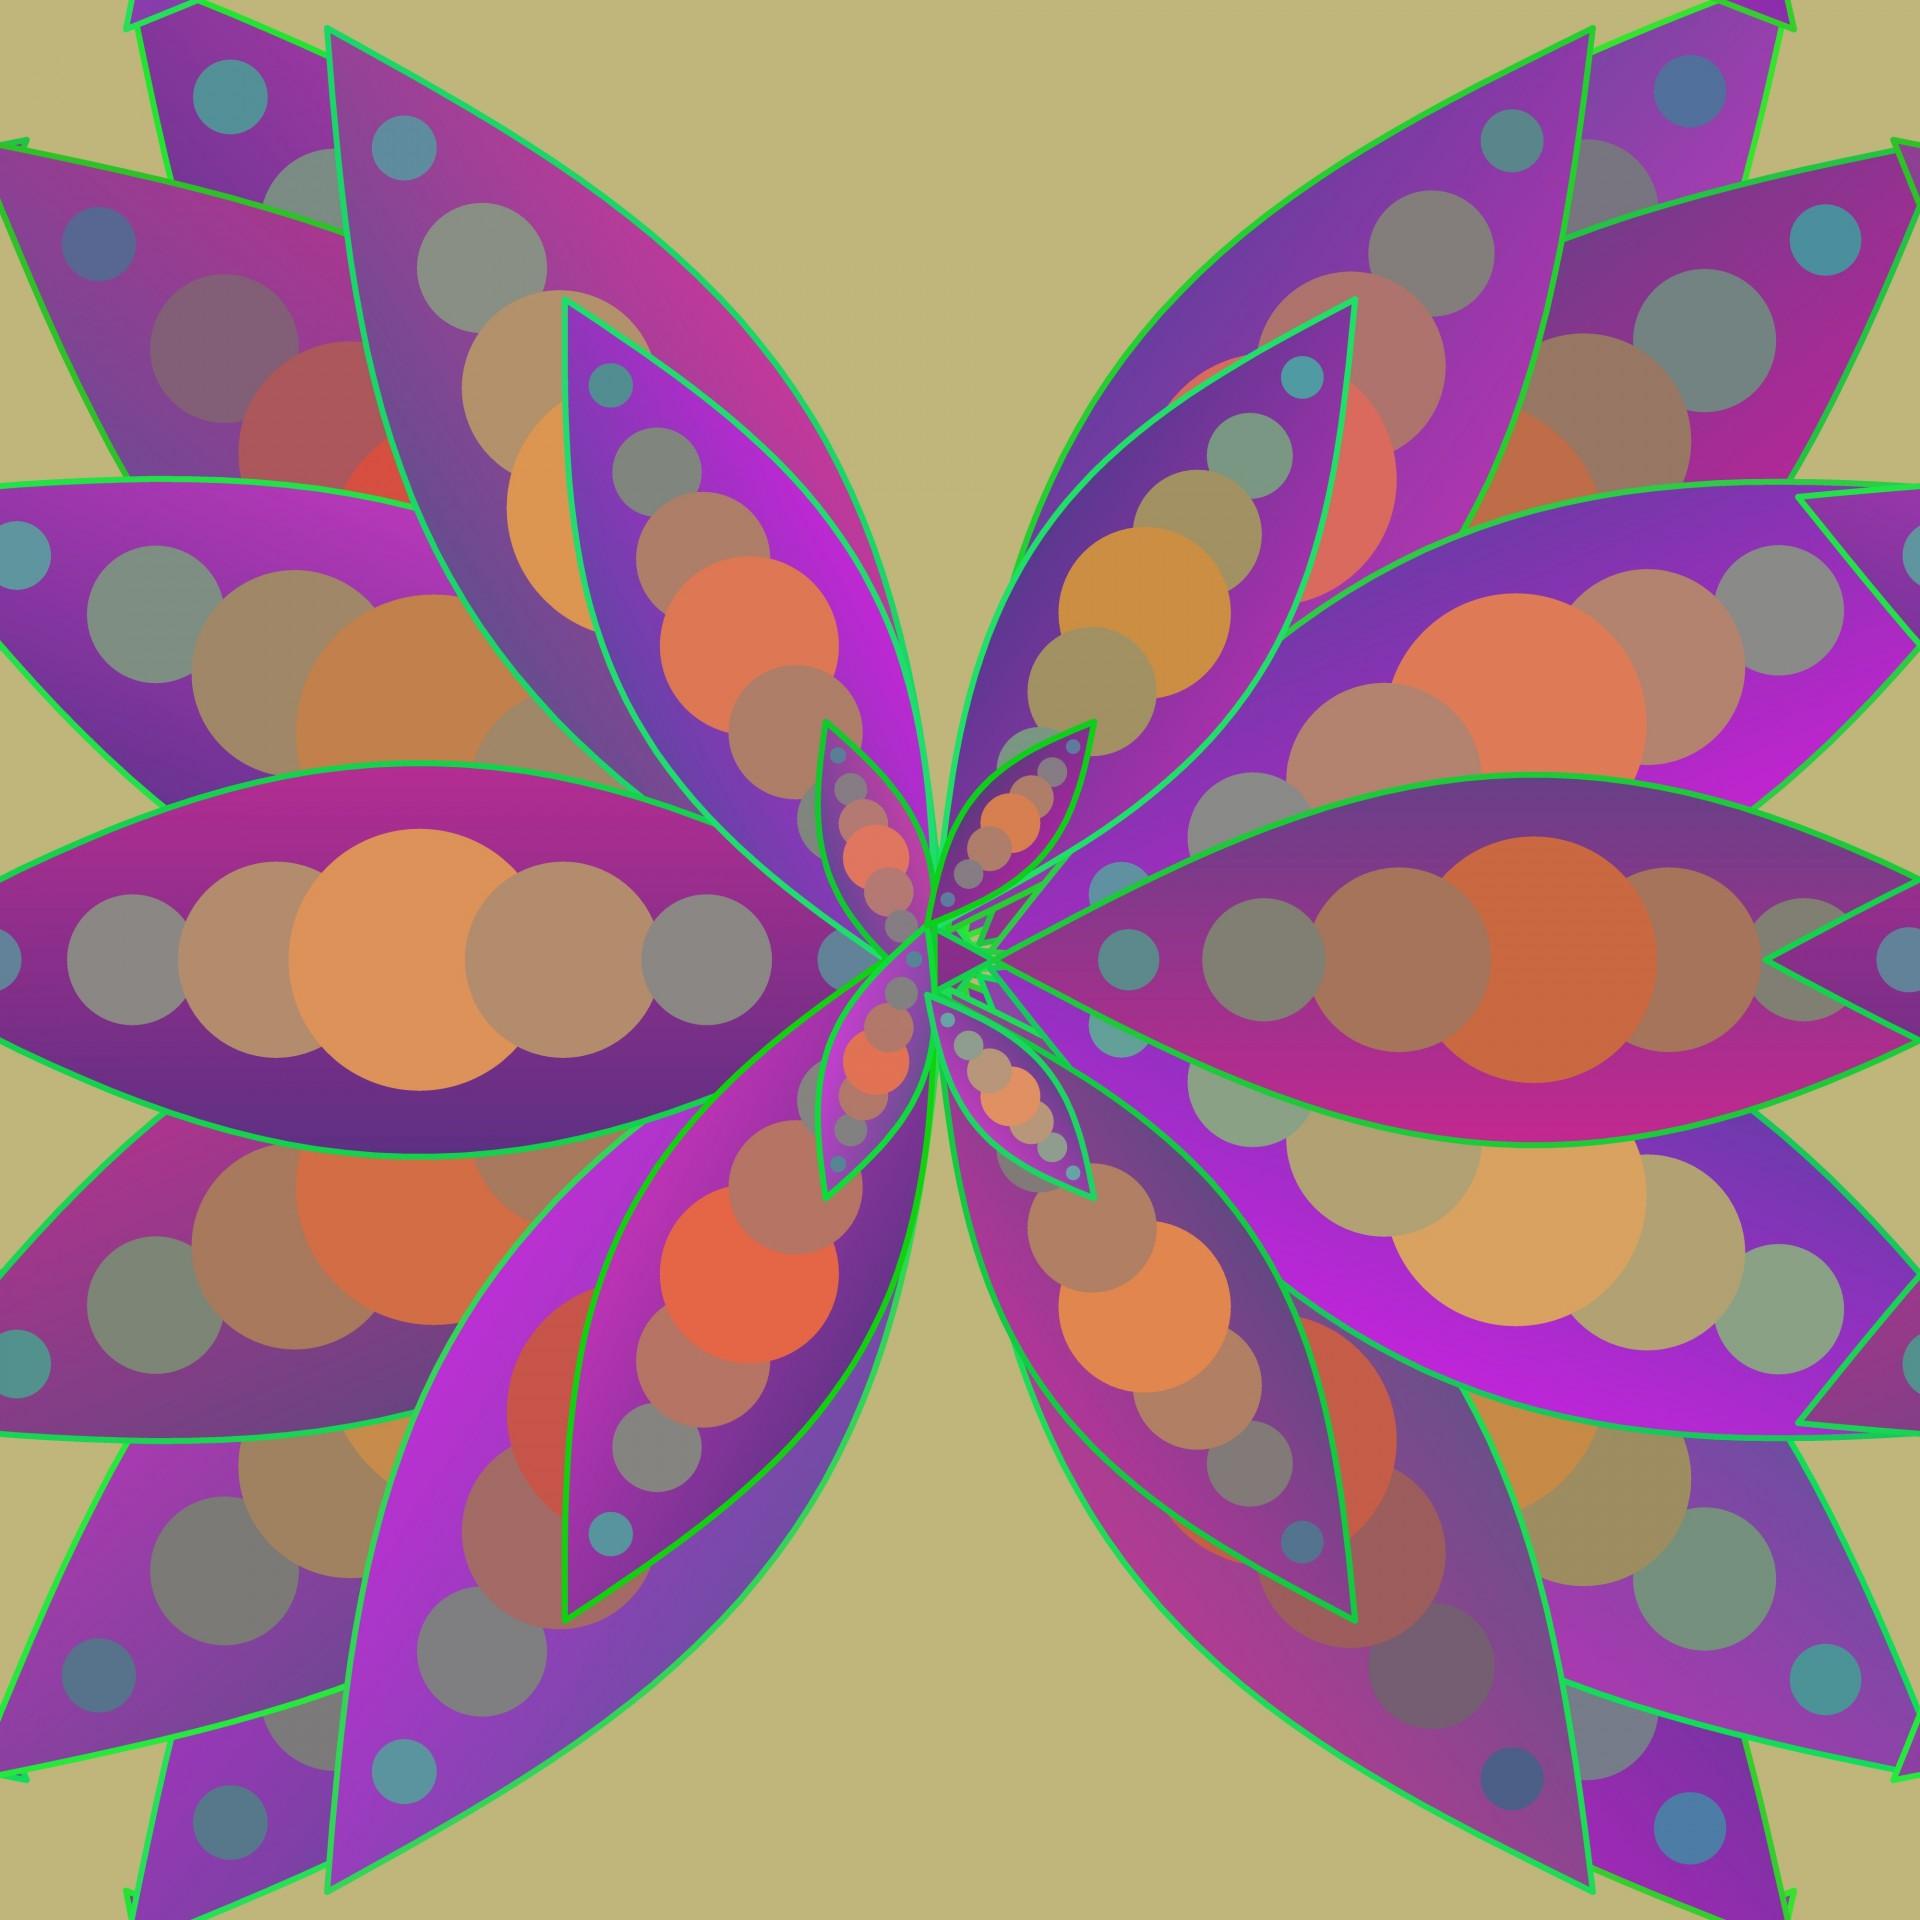 Free stock photo public. Butterfly clipart mandala